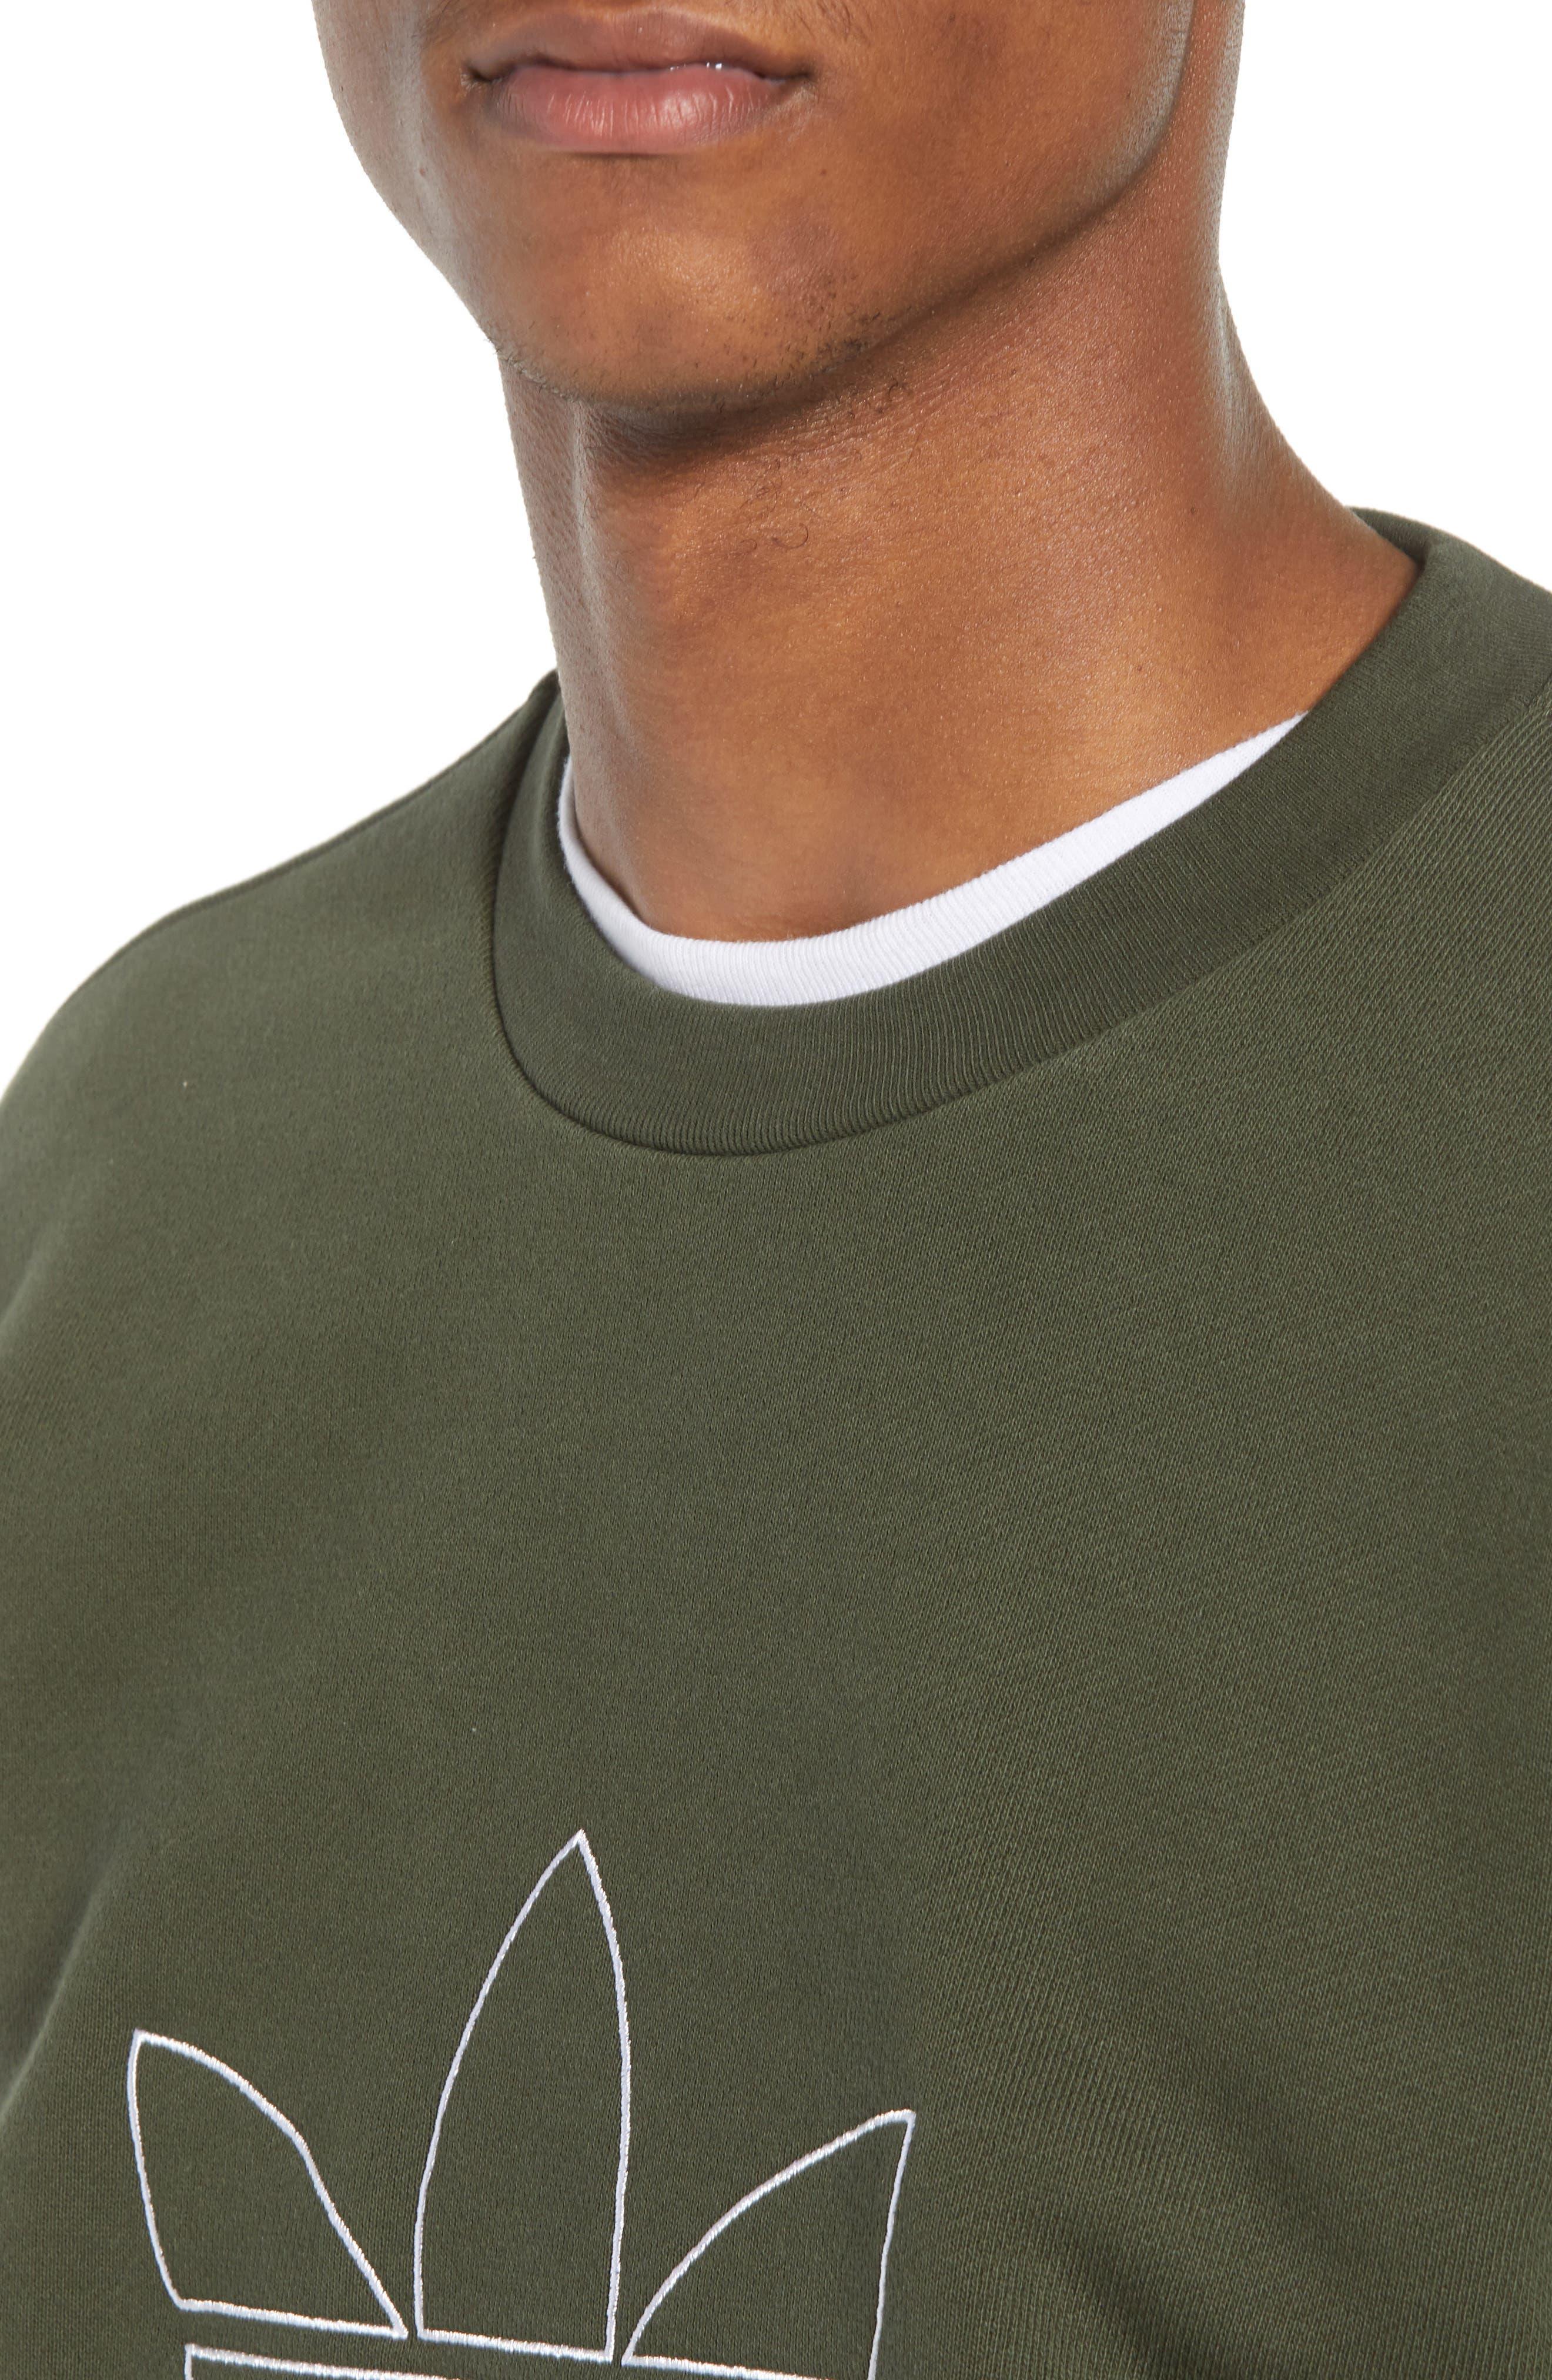 adidas Outline Trefoil Crewneck Sweatshirt,                             Alternate thumbnail 4, color,                             307